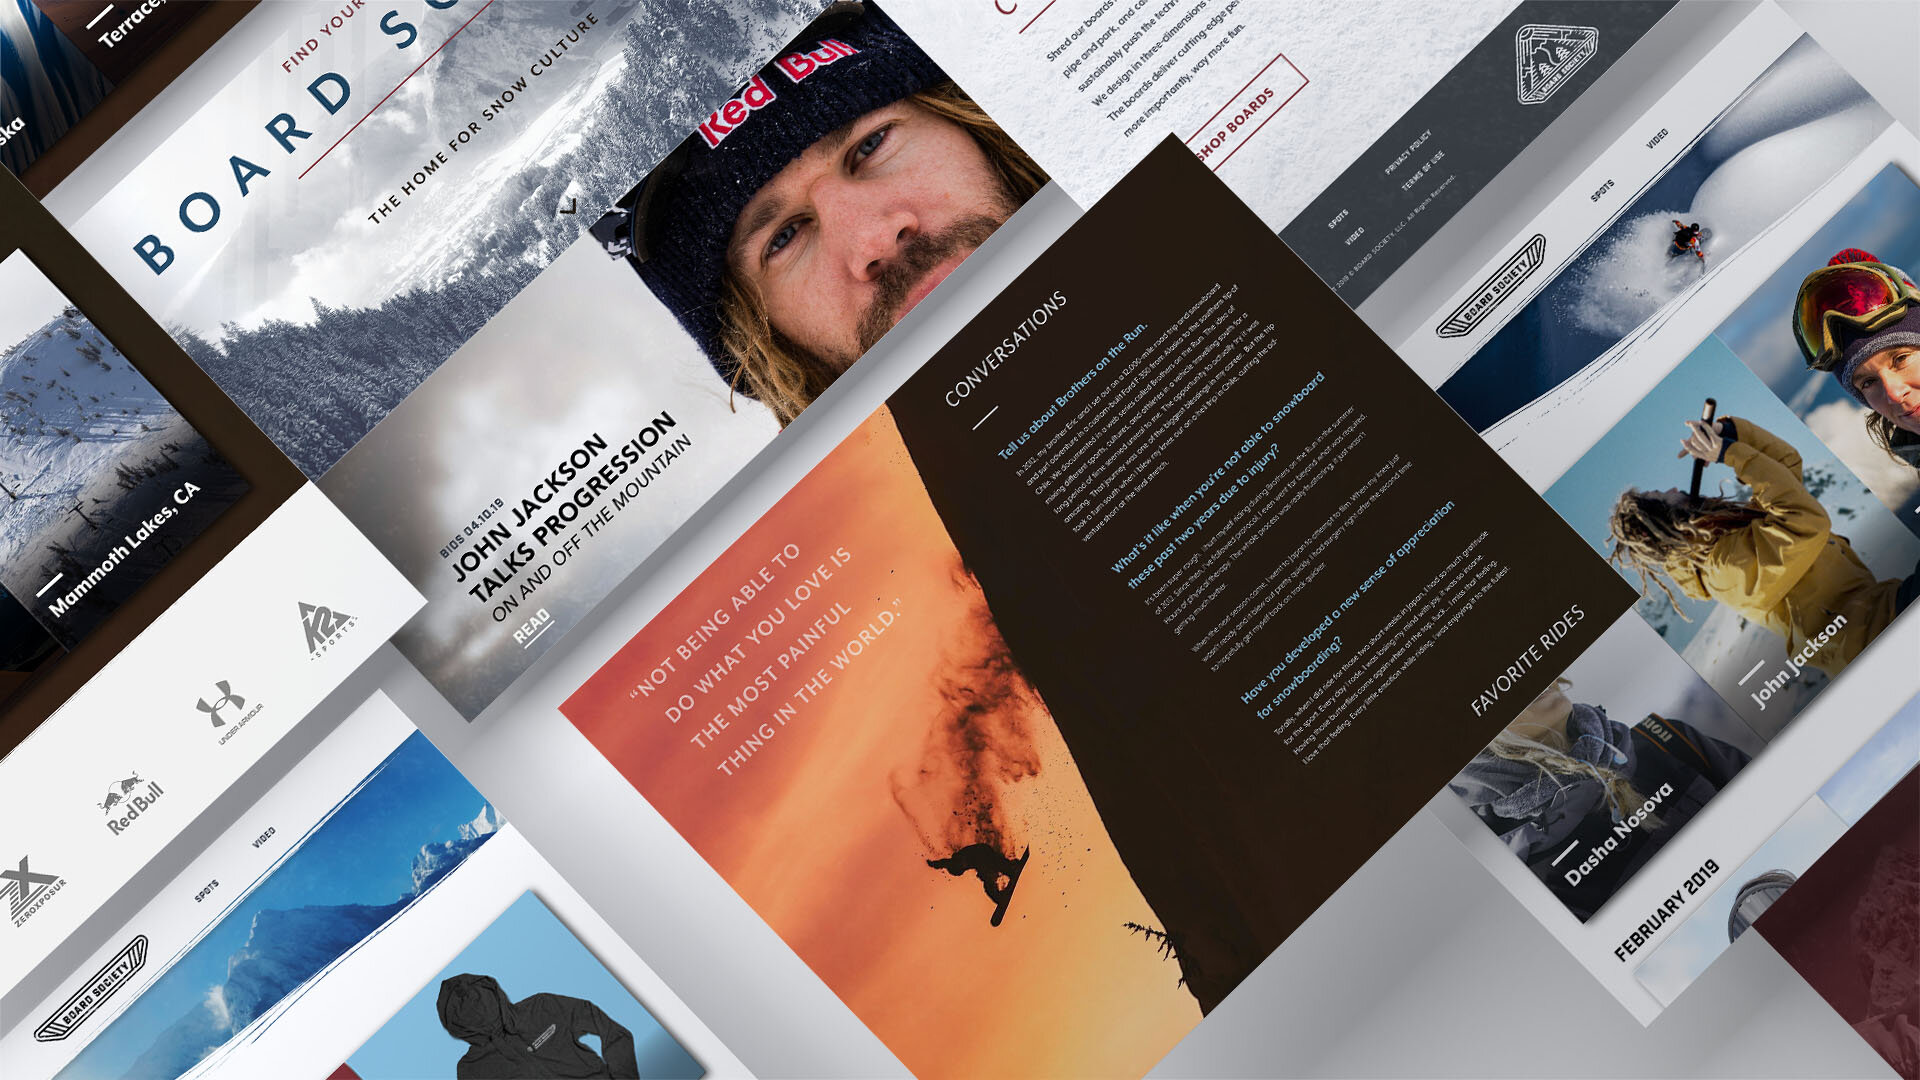 Screenshots from the web design